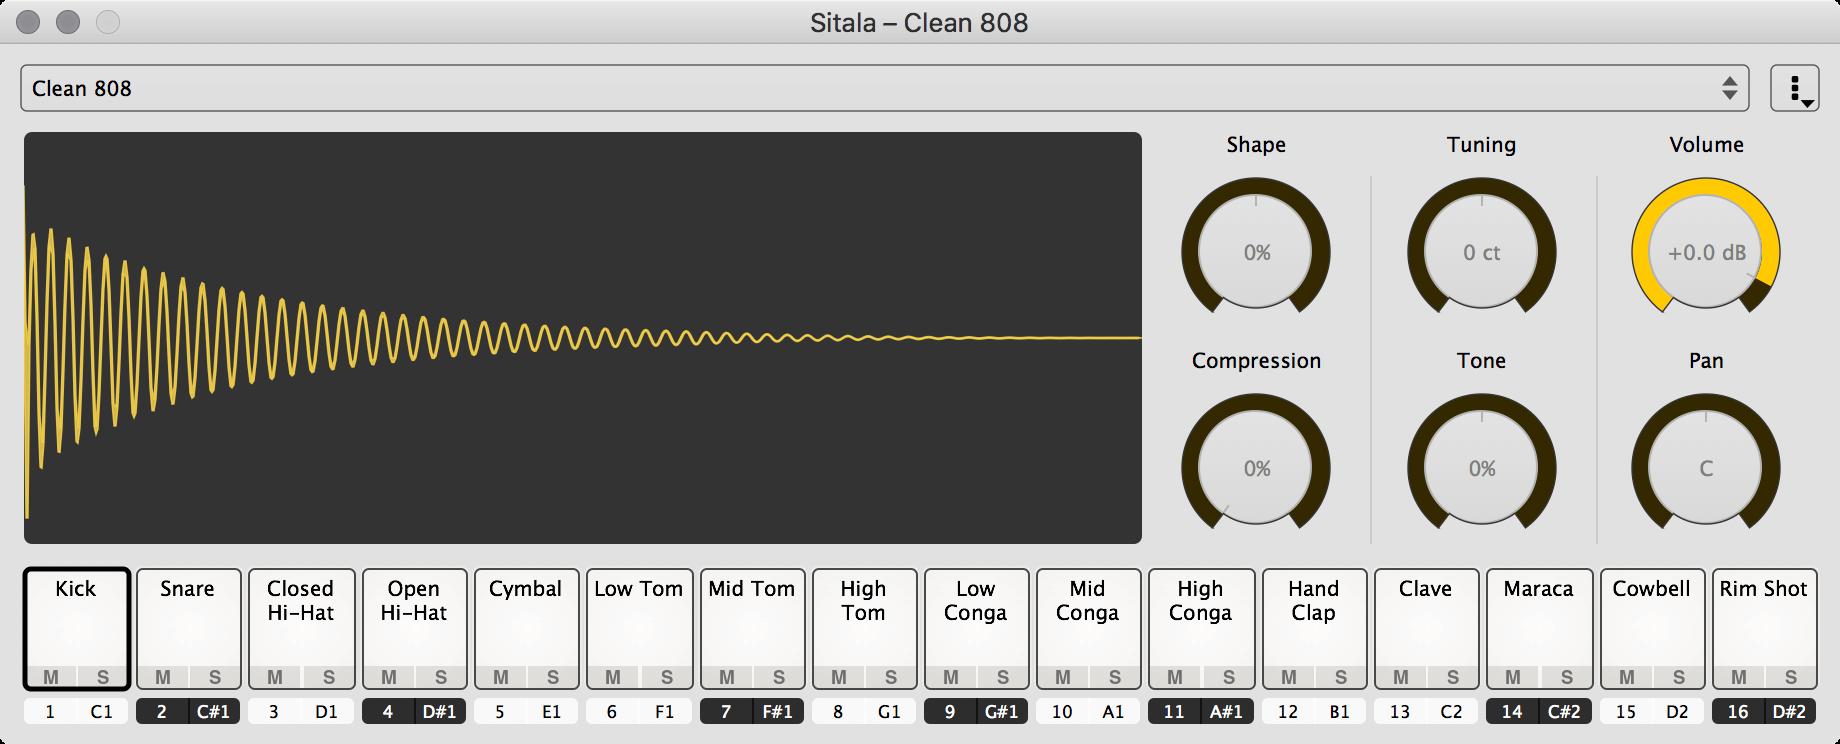 Decomposer updates Sitala free drum sampler plugin to Beta 2